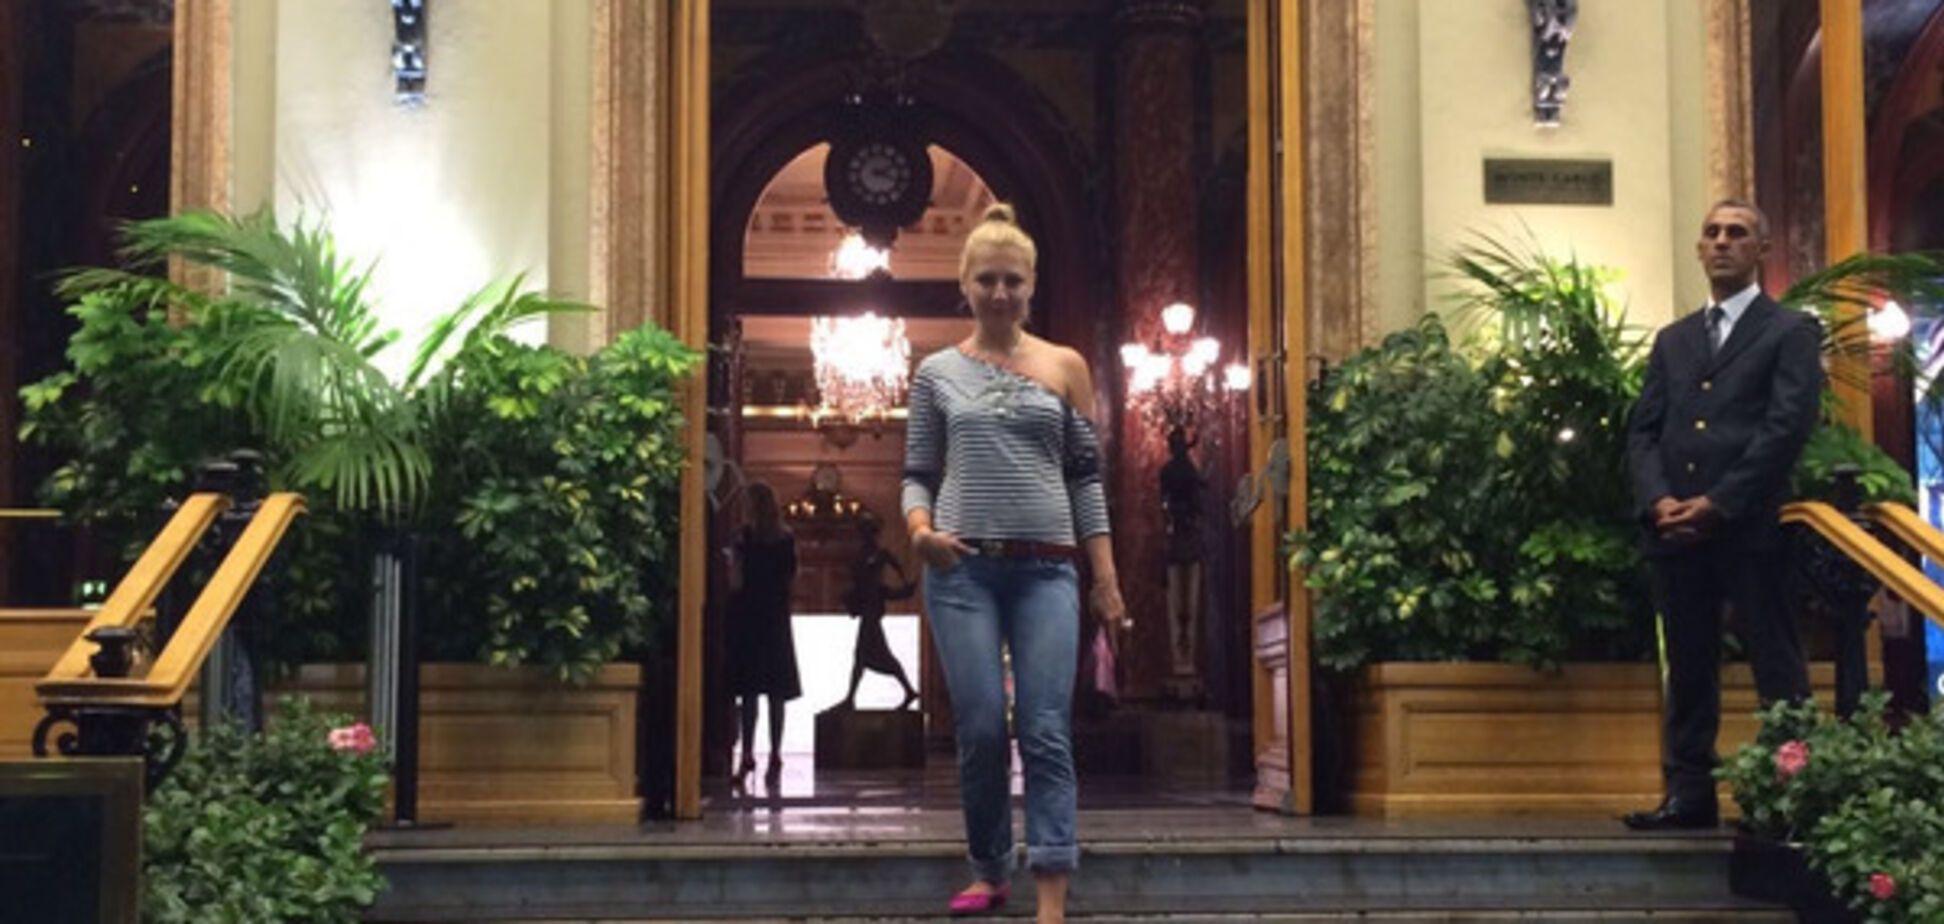 Casino Monte-Carlo - царство шика и азарта